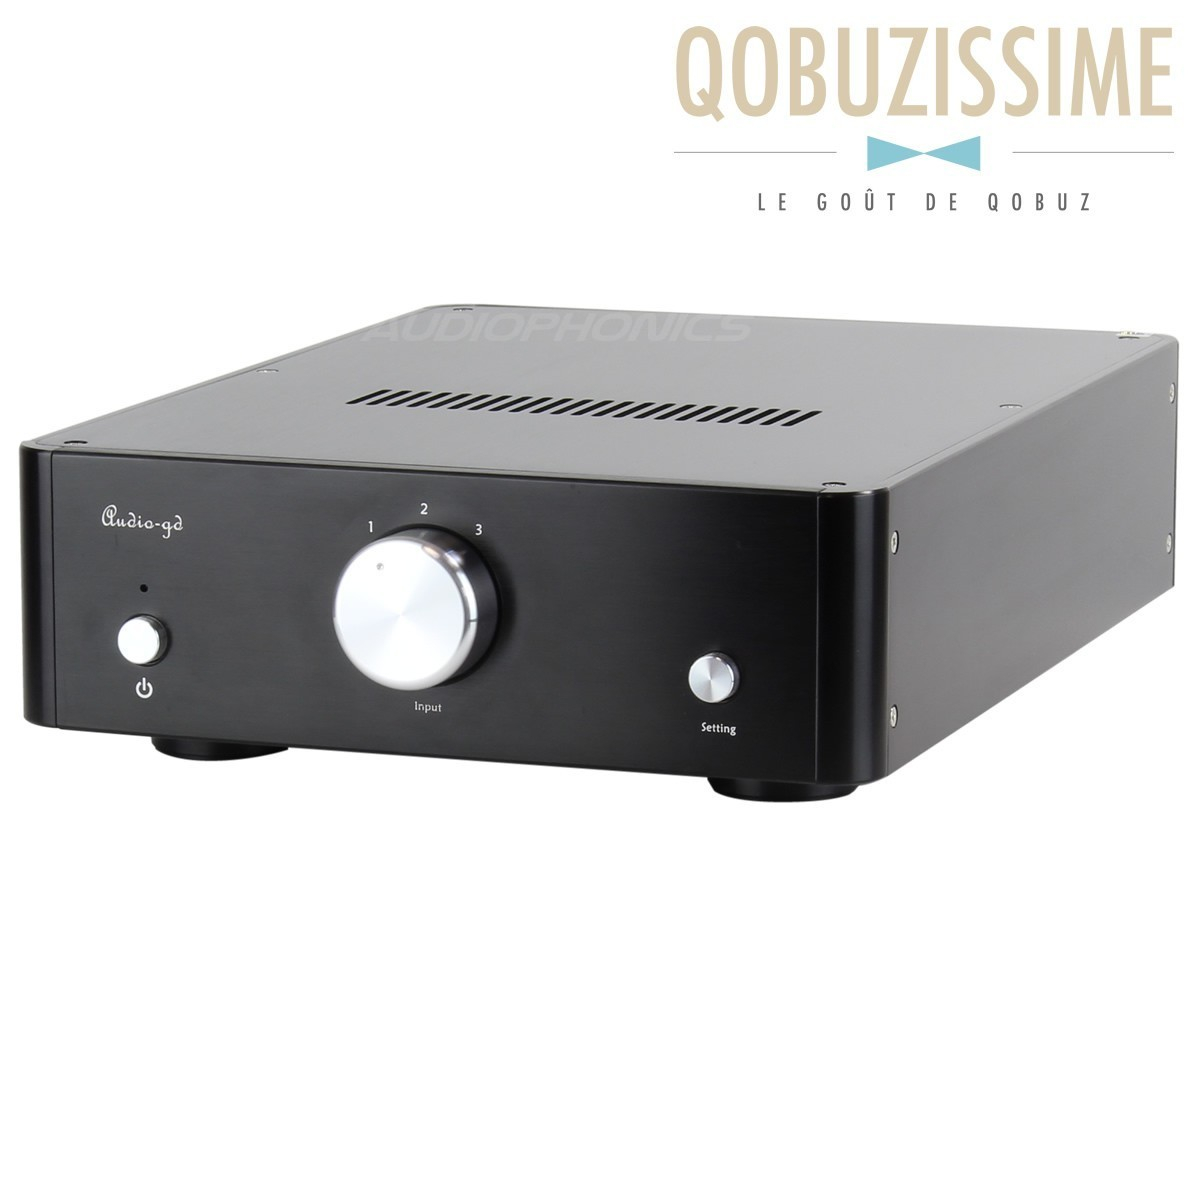 AUDIO-GD NOS 19 DAC PCM1704UK & DSP USB AMANERO Asynchrone FIFO 384KHz Noir